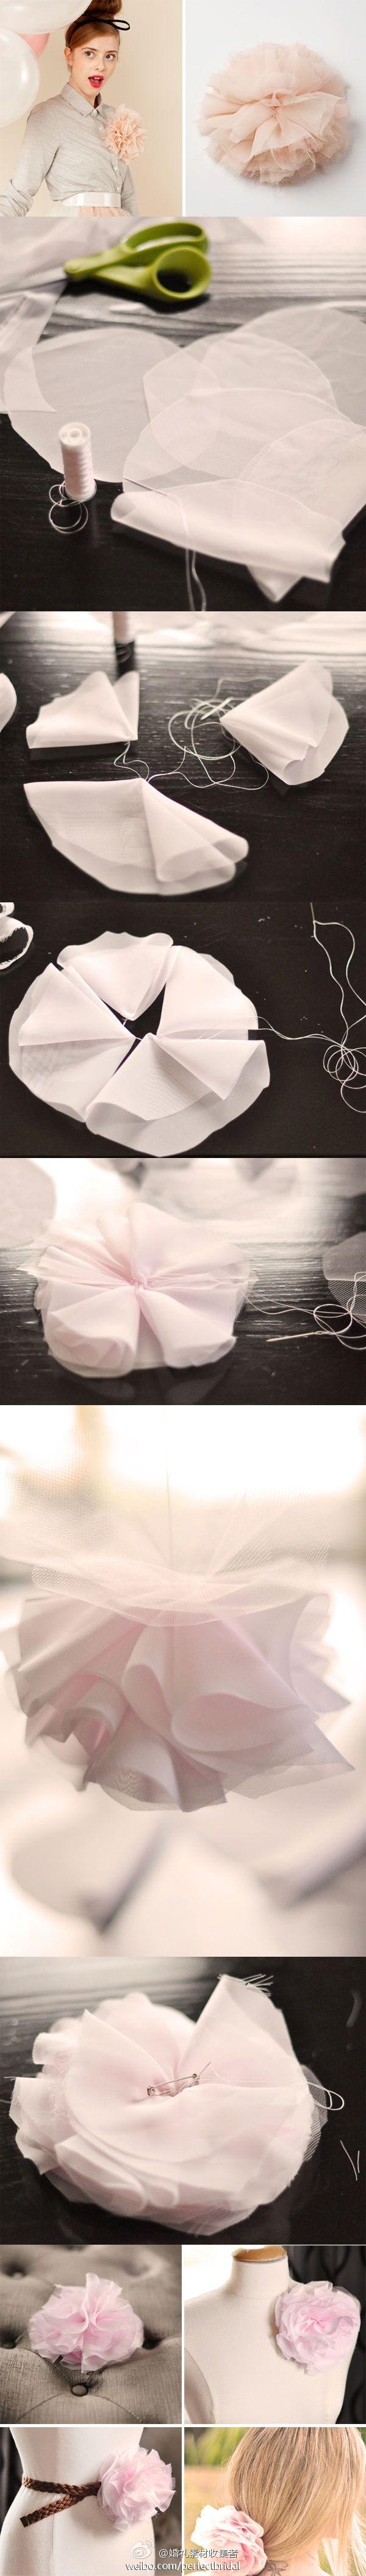 Inspirational Monday – Do it yourself (diy) Flower series – DIY Bridal Flower…